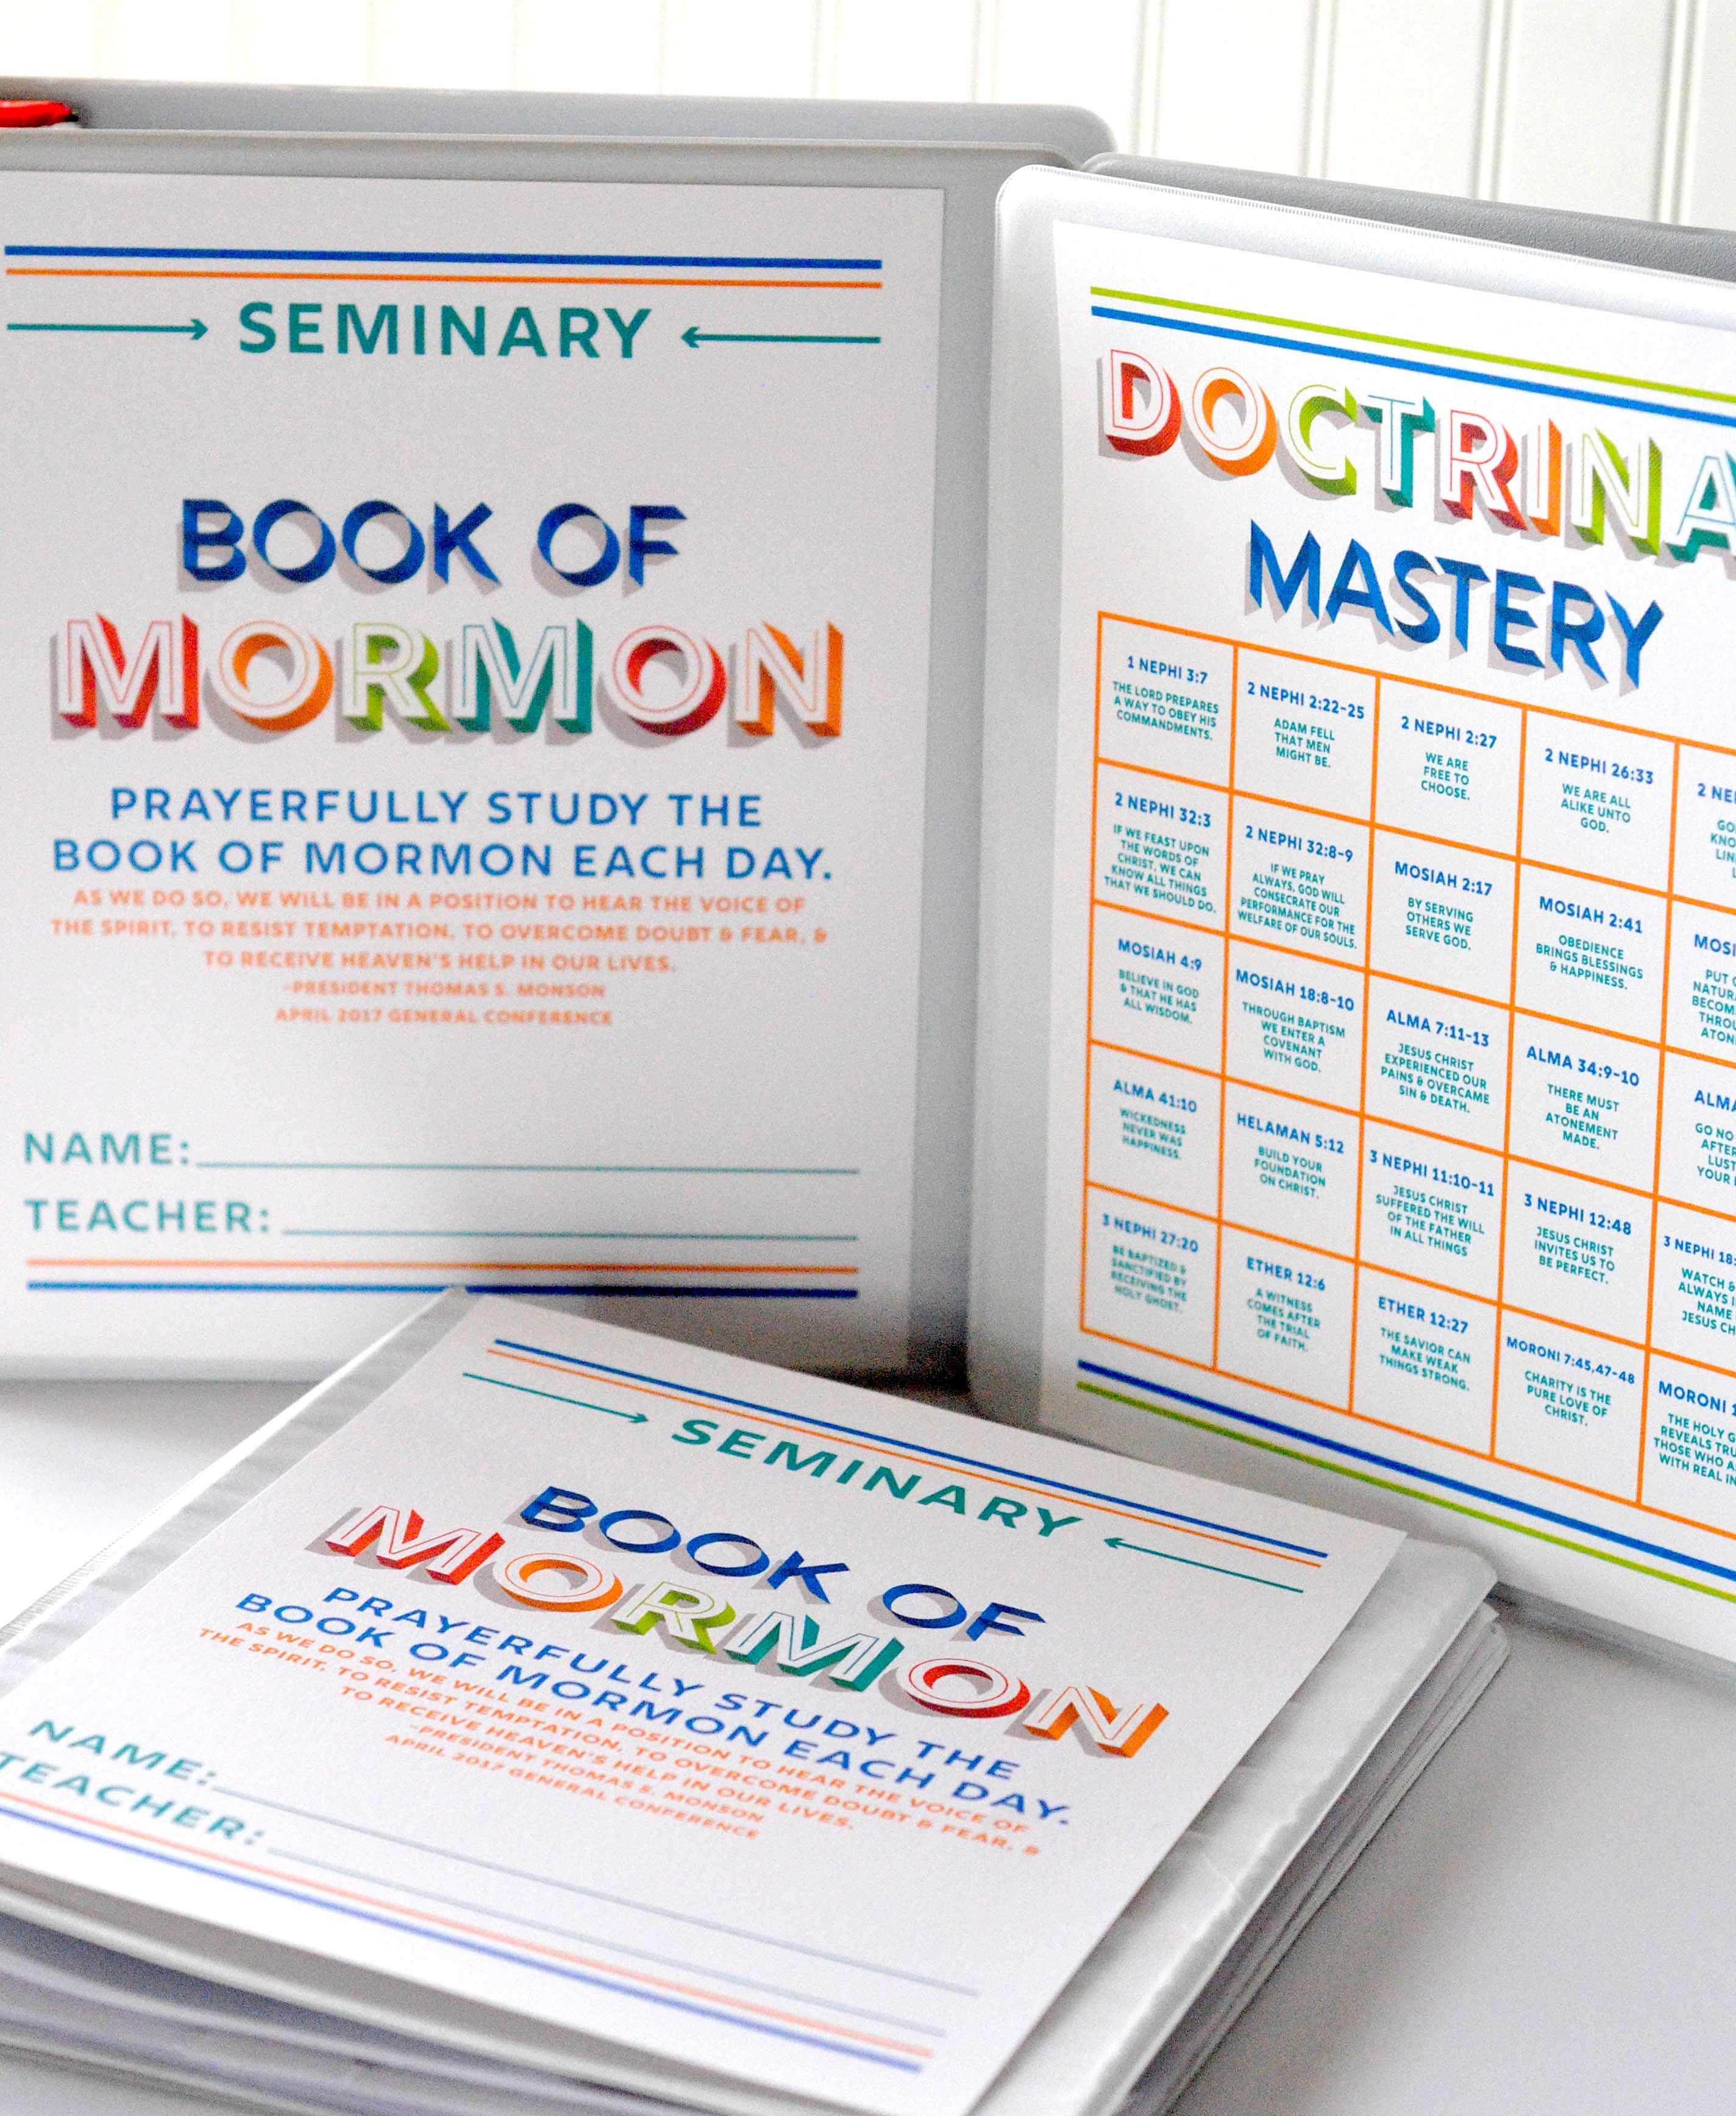 book of mormon seminary binder covers www teepeegirl com